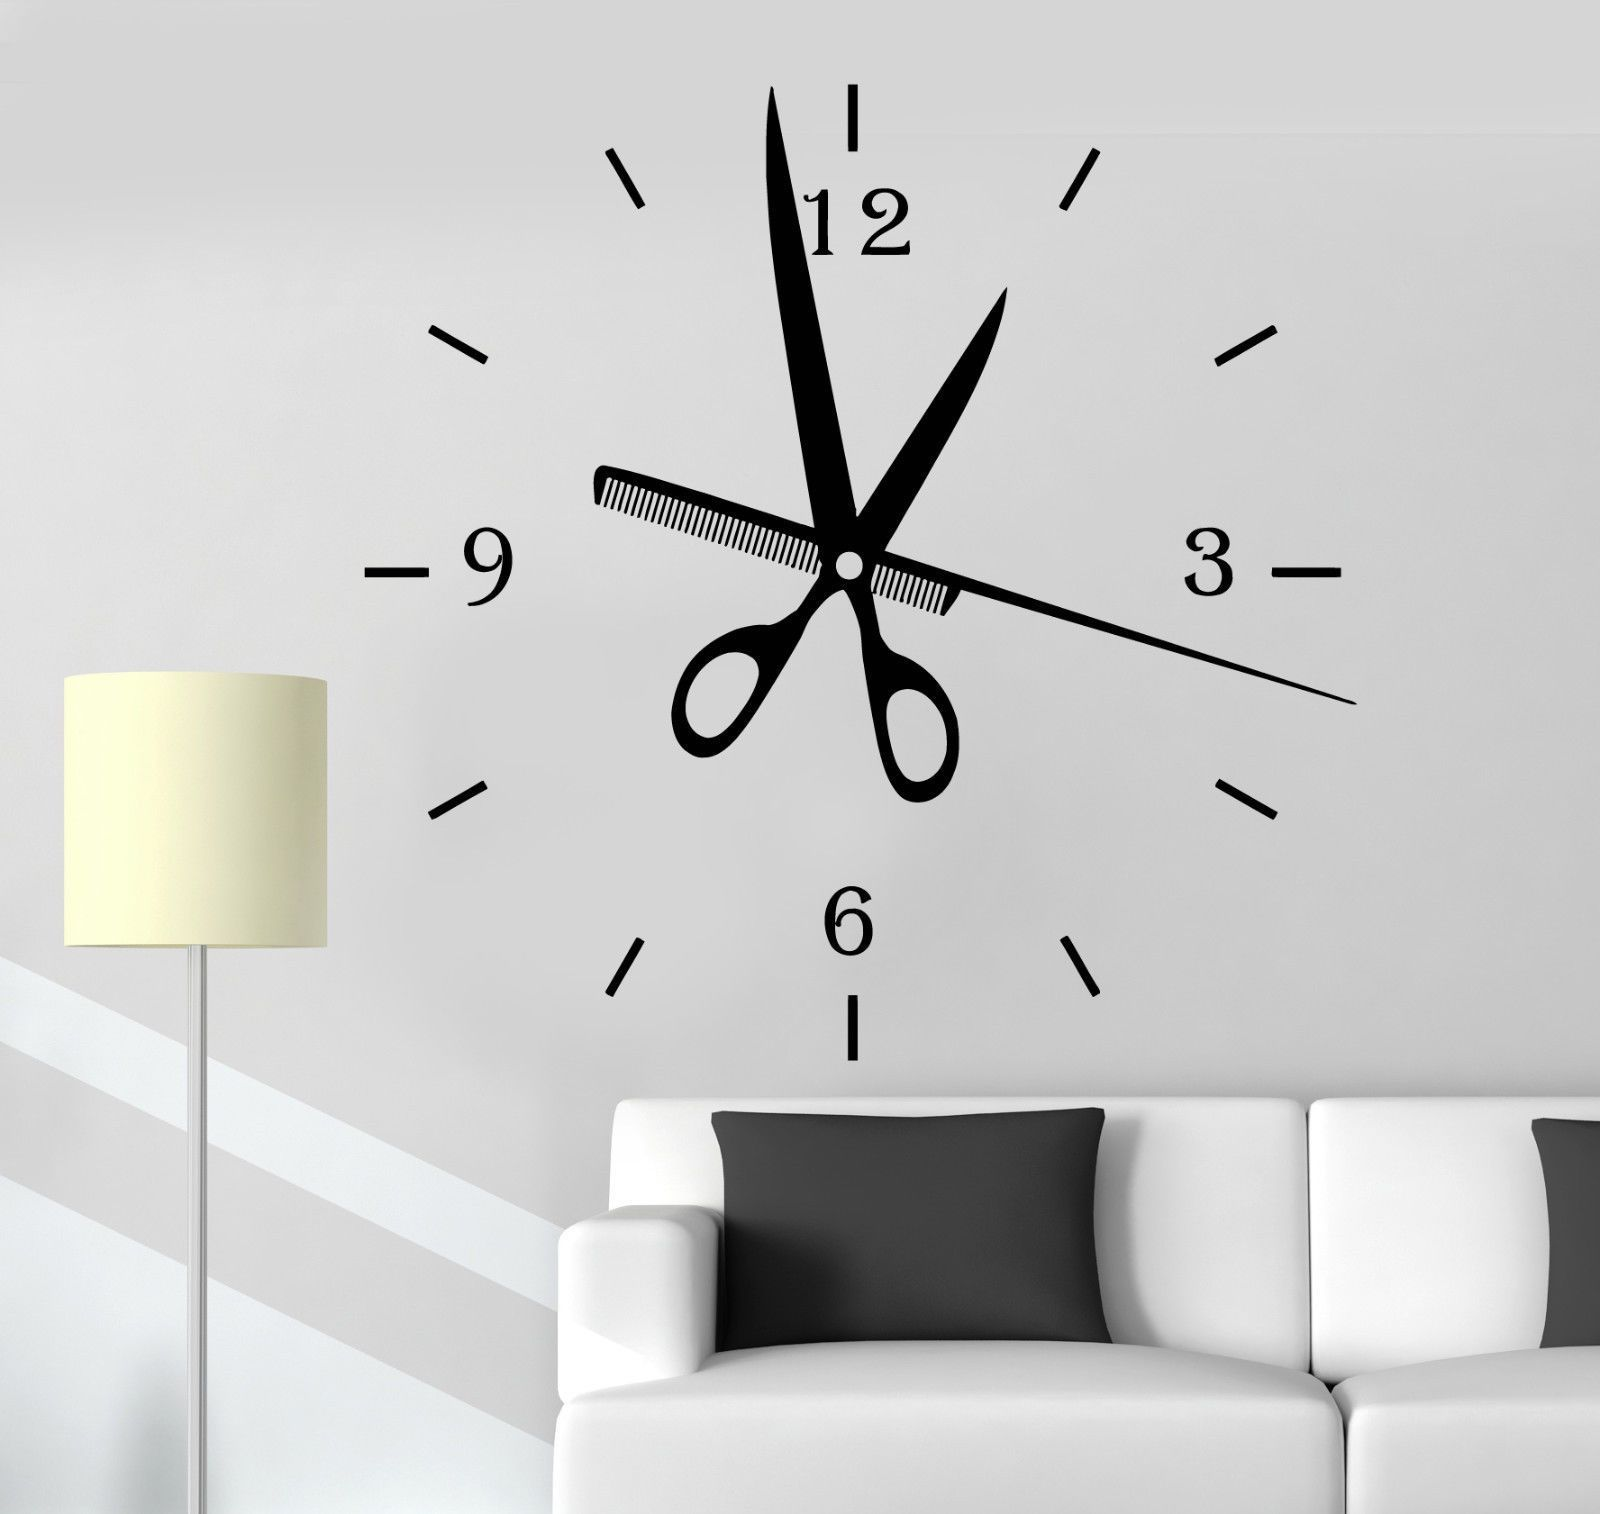 Vinyl Wall Decal Hair Salon Clock Art Decor Barbershop Stylist Stickers (ig4767) | eBay